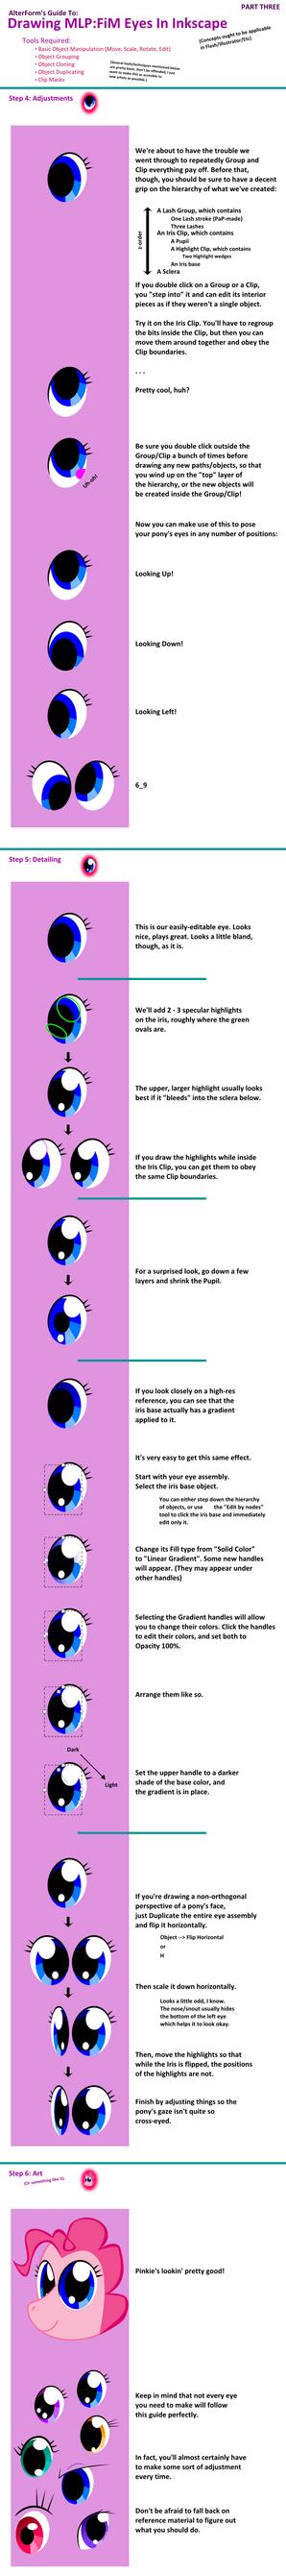 MLP: FiM Eye Tutorial Part 3 by AltrForm